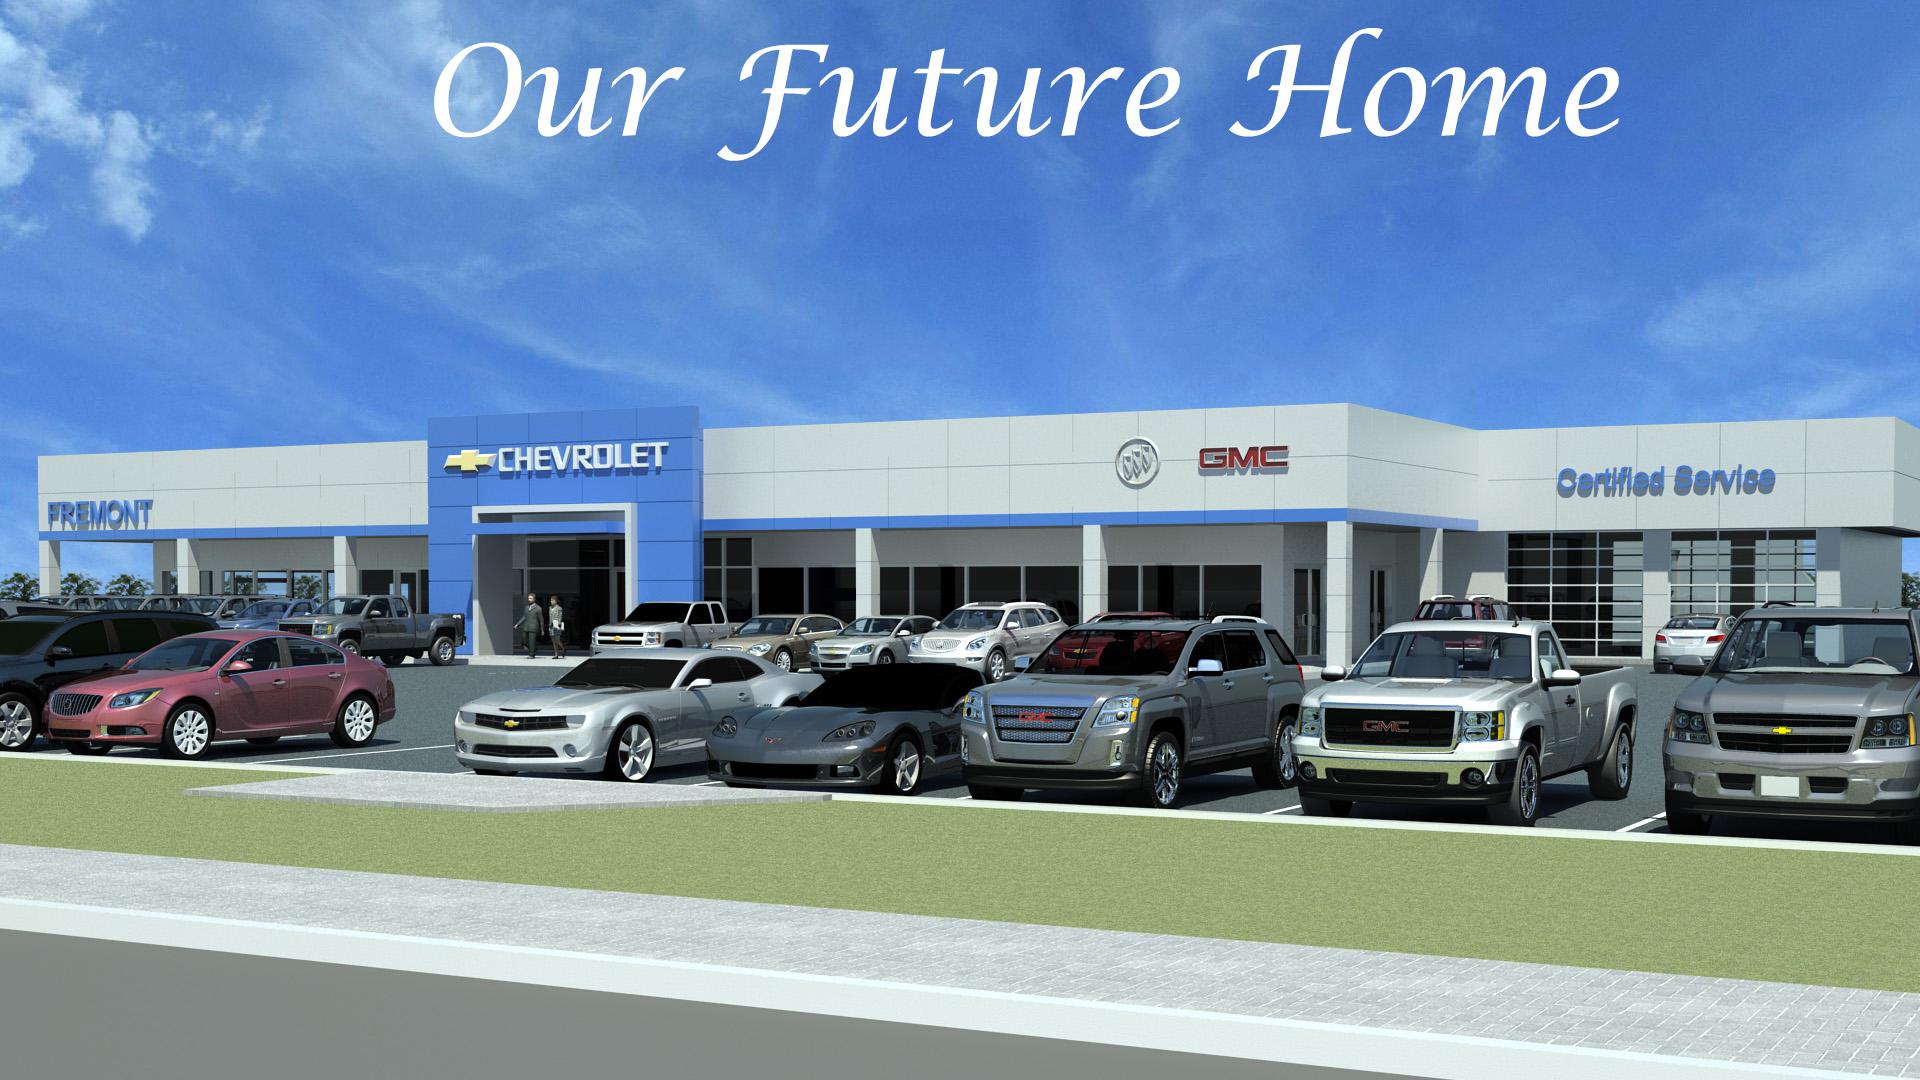 Fremont Chevrolet Buick GMC - ad image